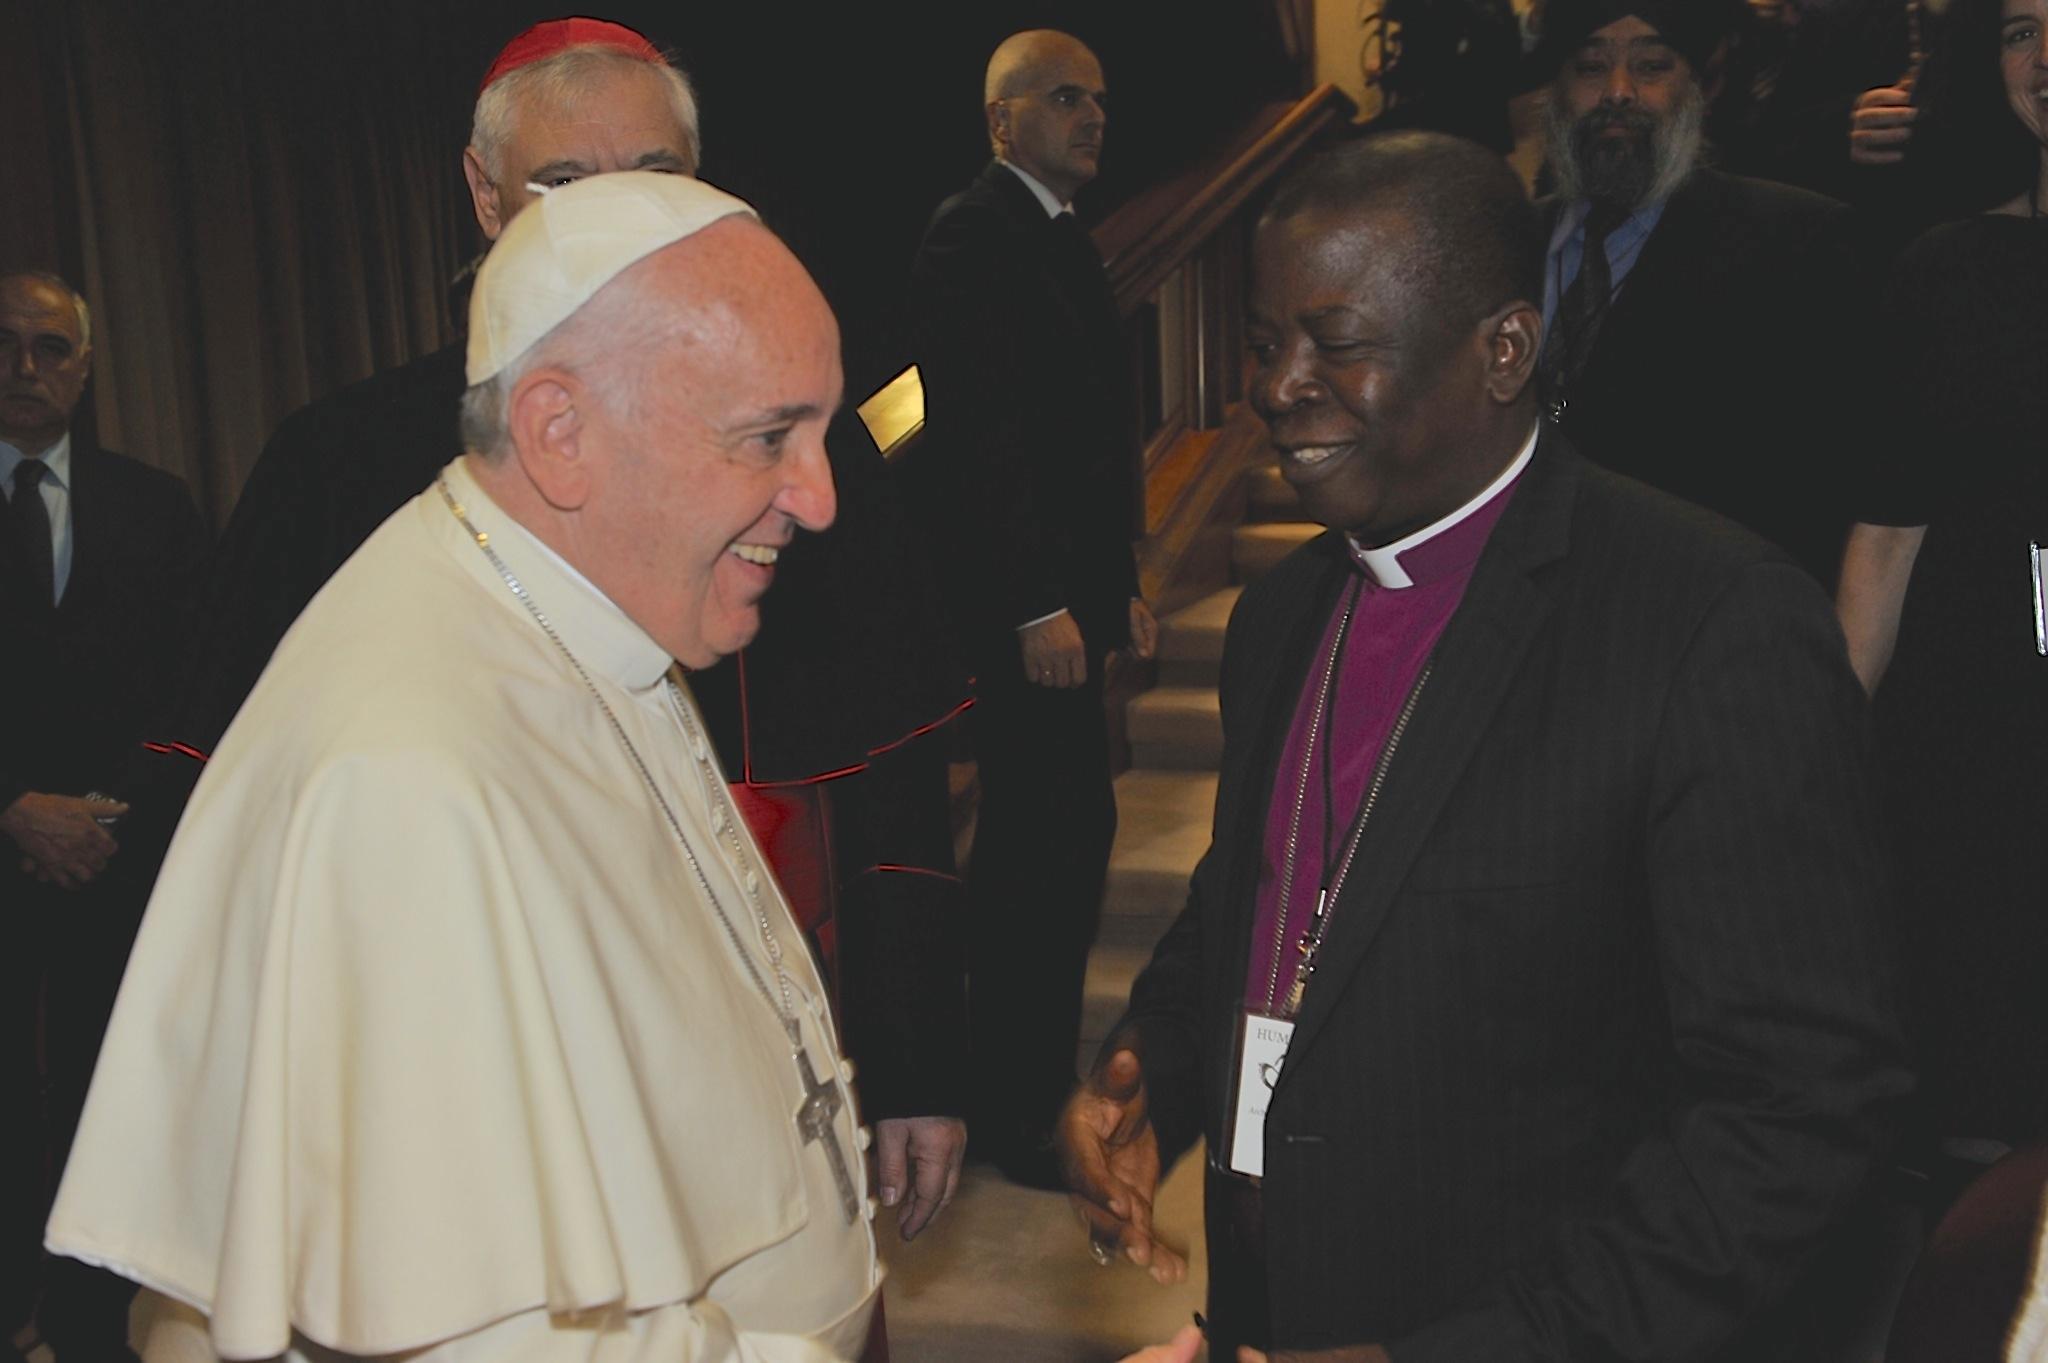 Archbishop thabo makgoba wife sexual dysfunction